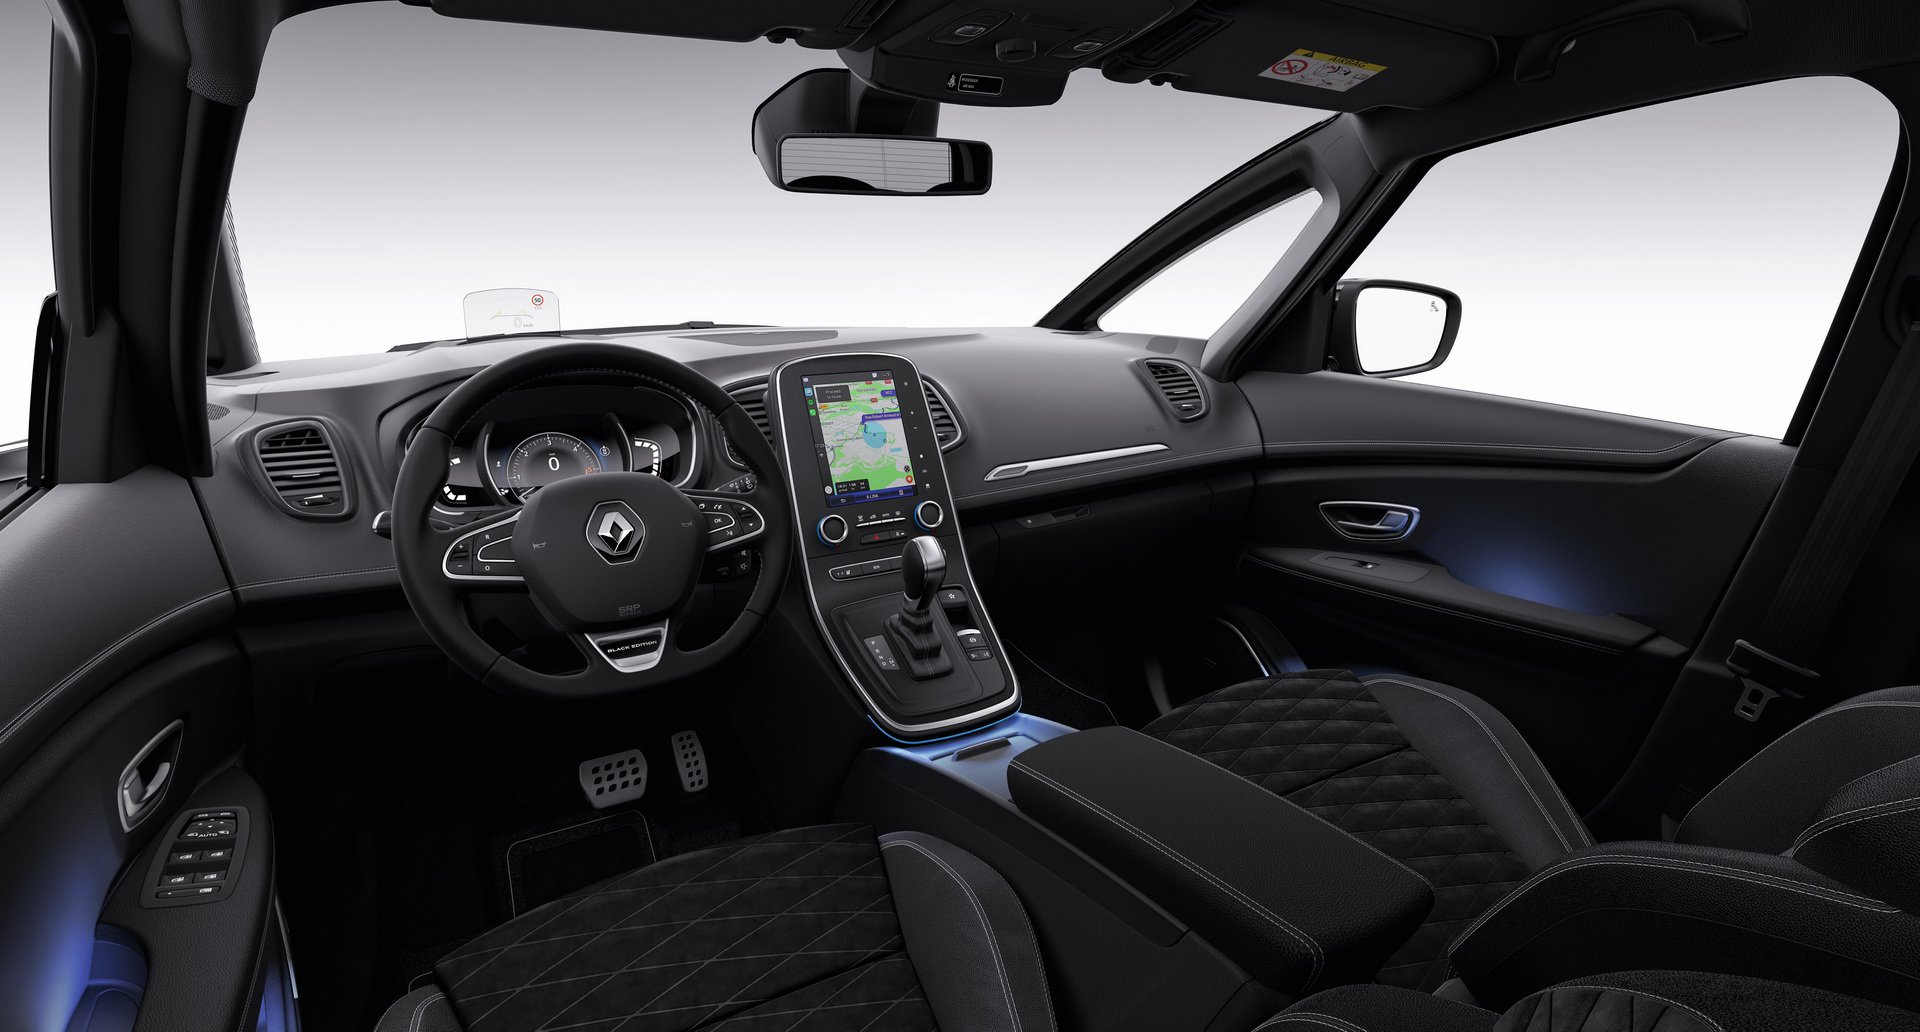 Renault Scenic και Grand Scenic Black Editions - Autoblog.gr